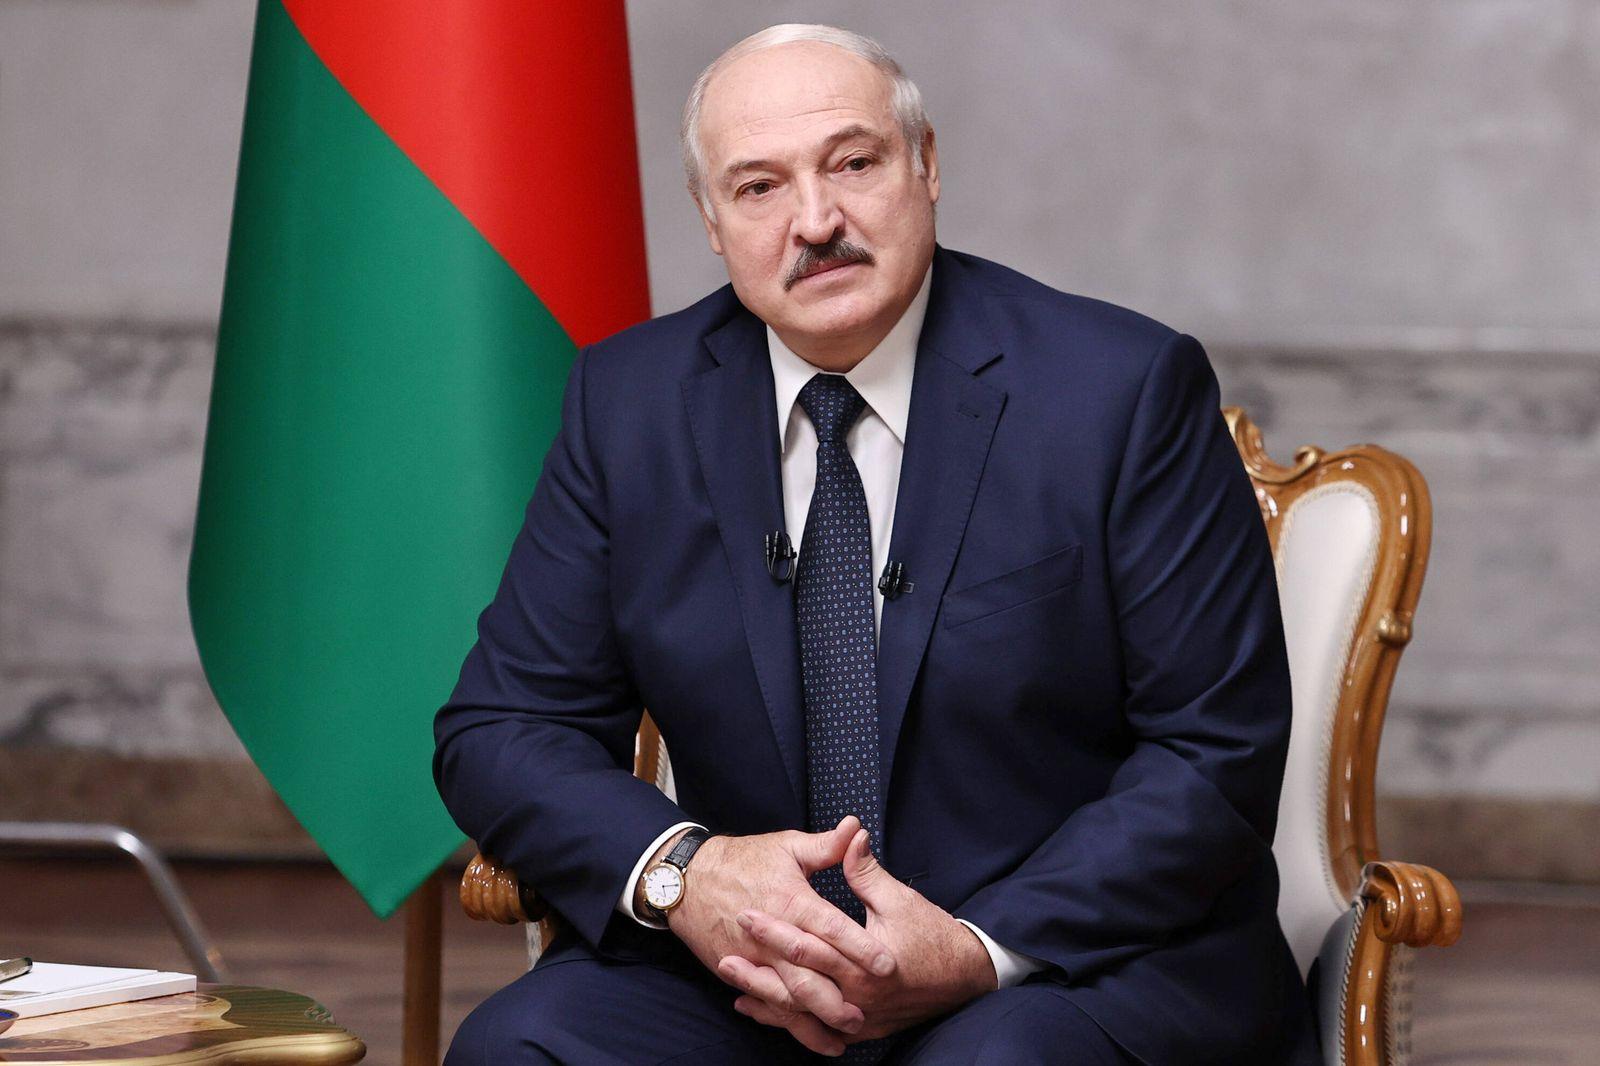 MINSK, BELARUS - SEPTEMBER 8, 2020: Belarus President Alexander Lukashenko gives an interview to leading Russian media